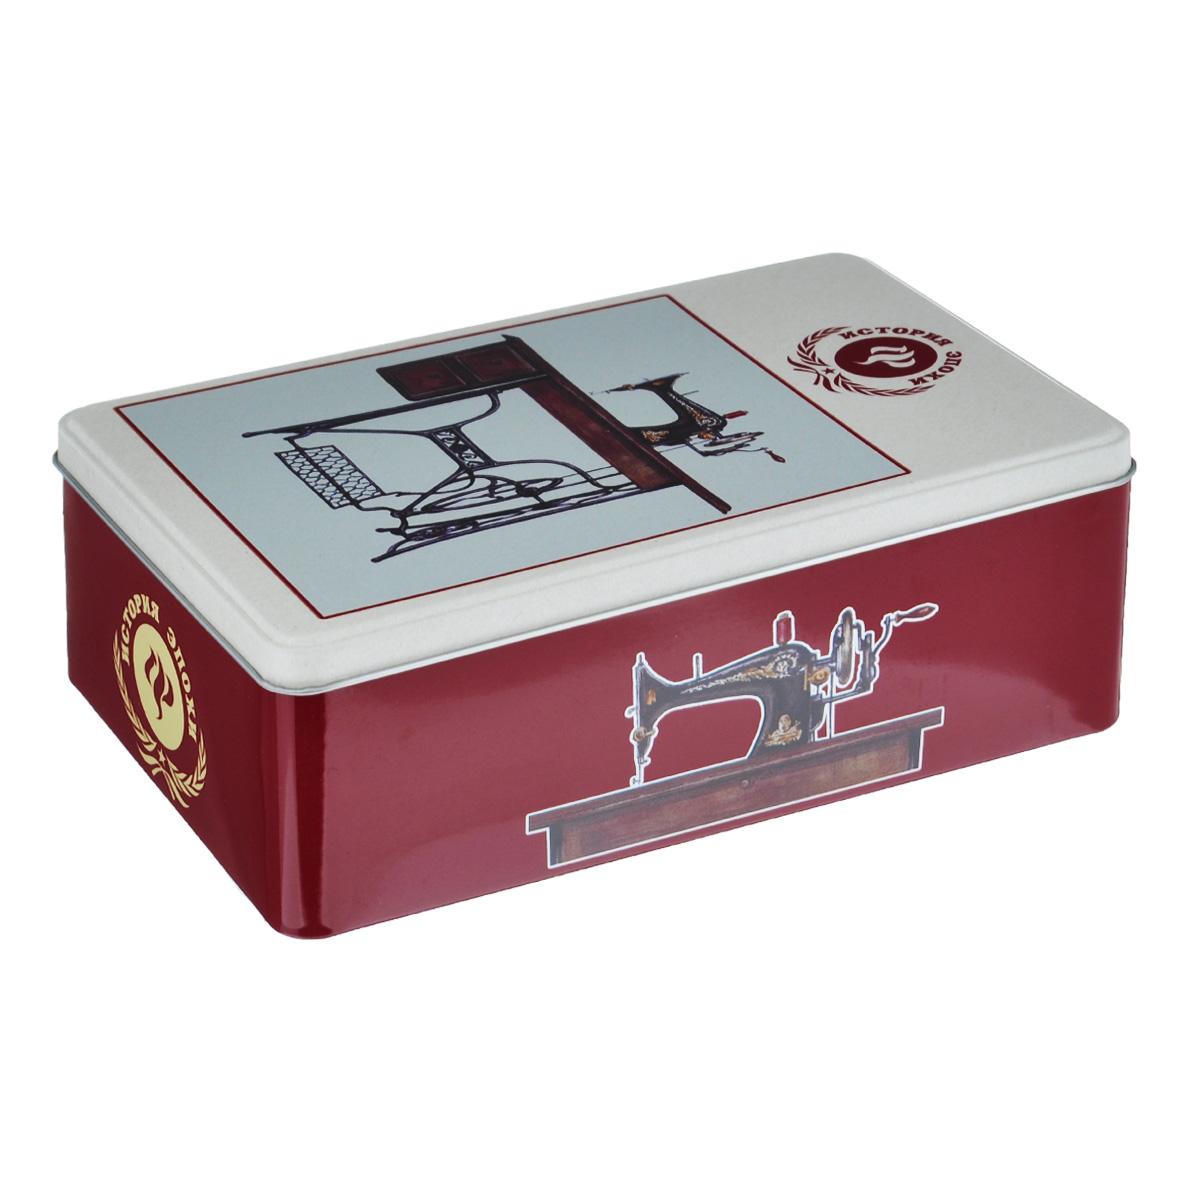 Коробка для хранения Феникс-презент